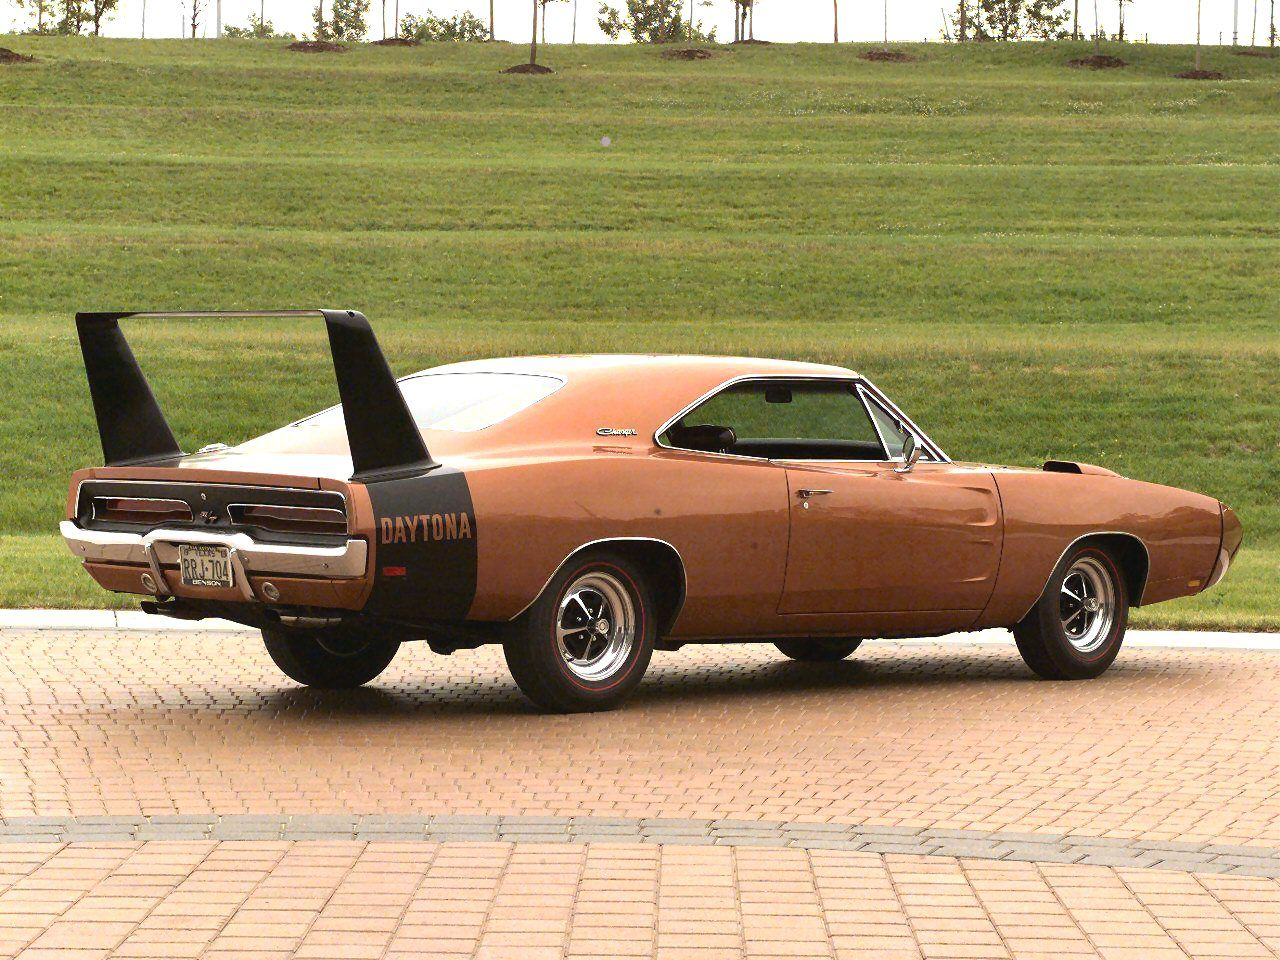 1969 Dodge Charger Daytona Copper Muscle Cars Dodge Charger Daytona Dodge